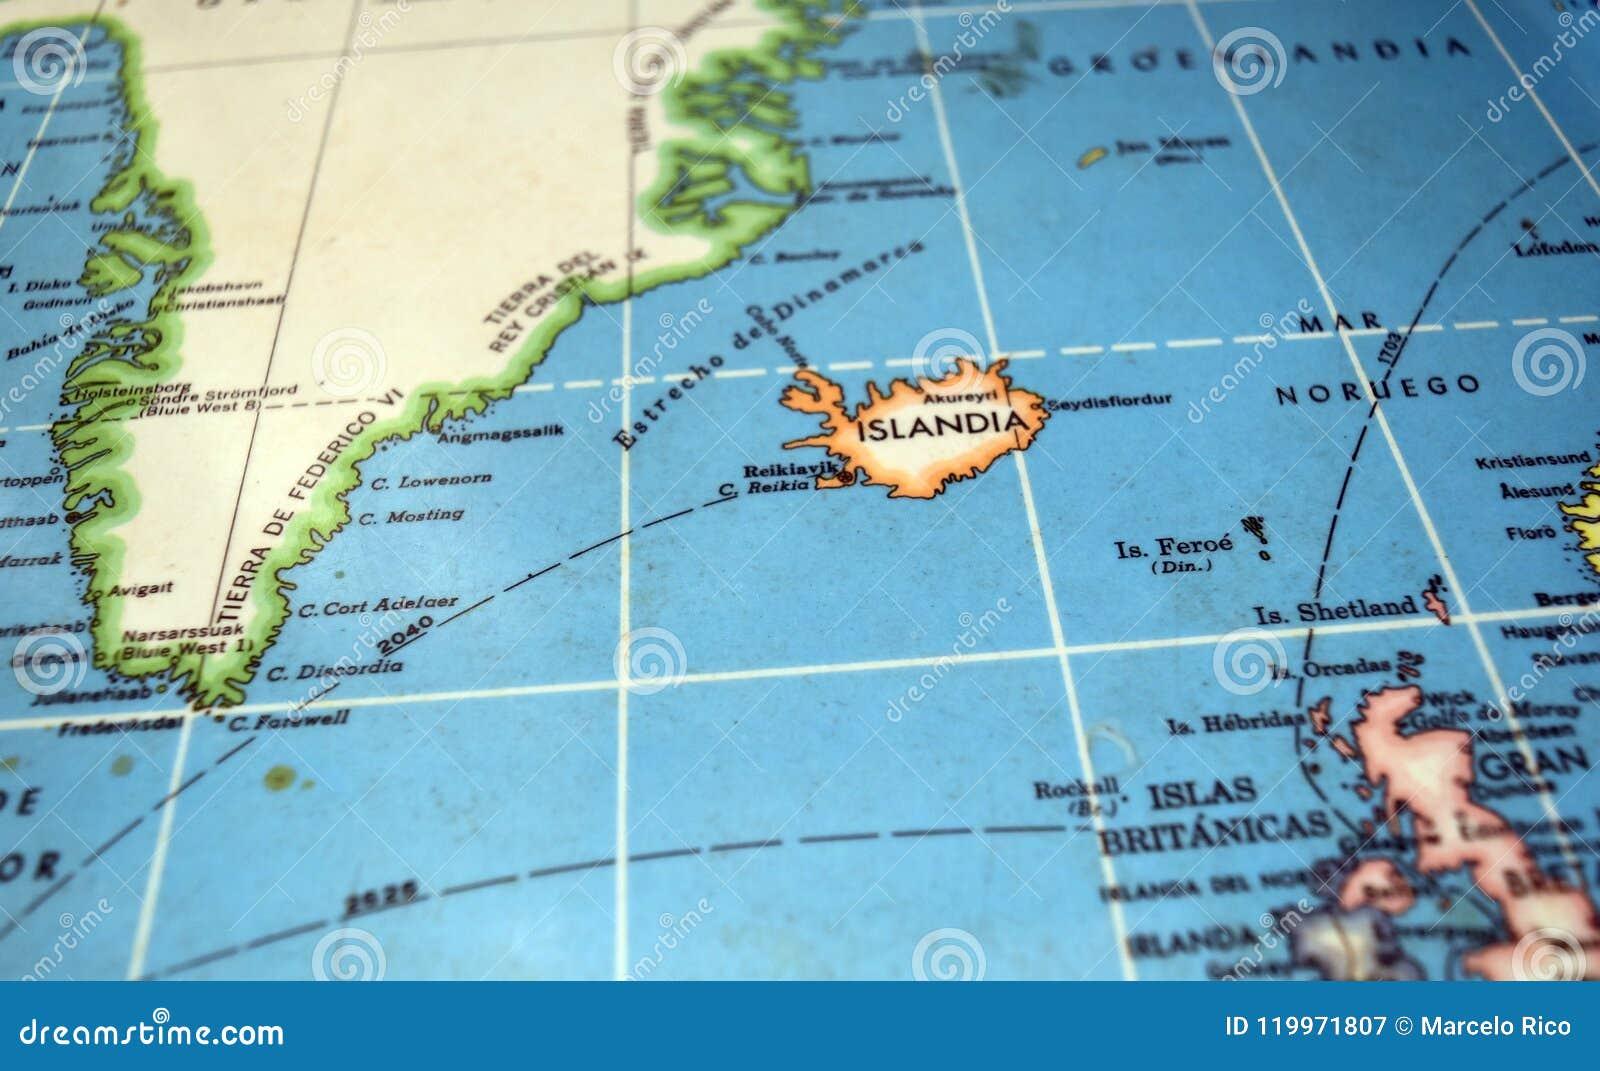 Iceland Map Stock Image Image Of Britanicas Mapa Noruego